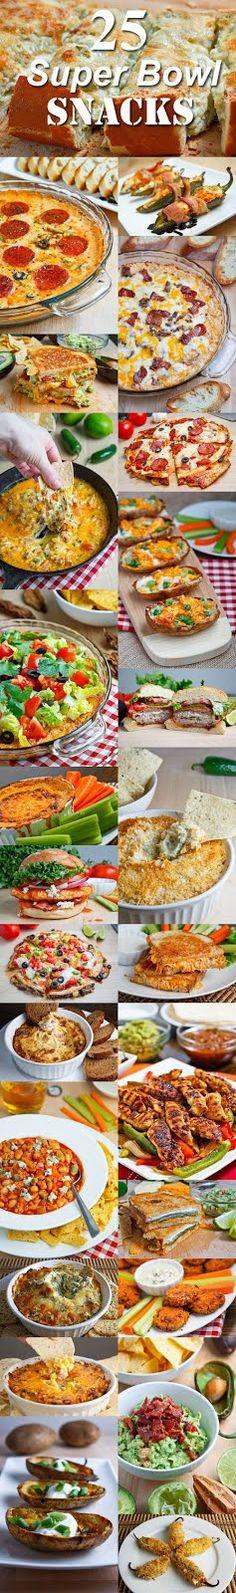 Closet Cooking: 25 Scrumptious Super Bowl Snacks